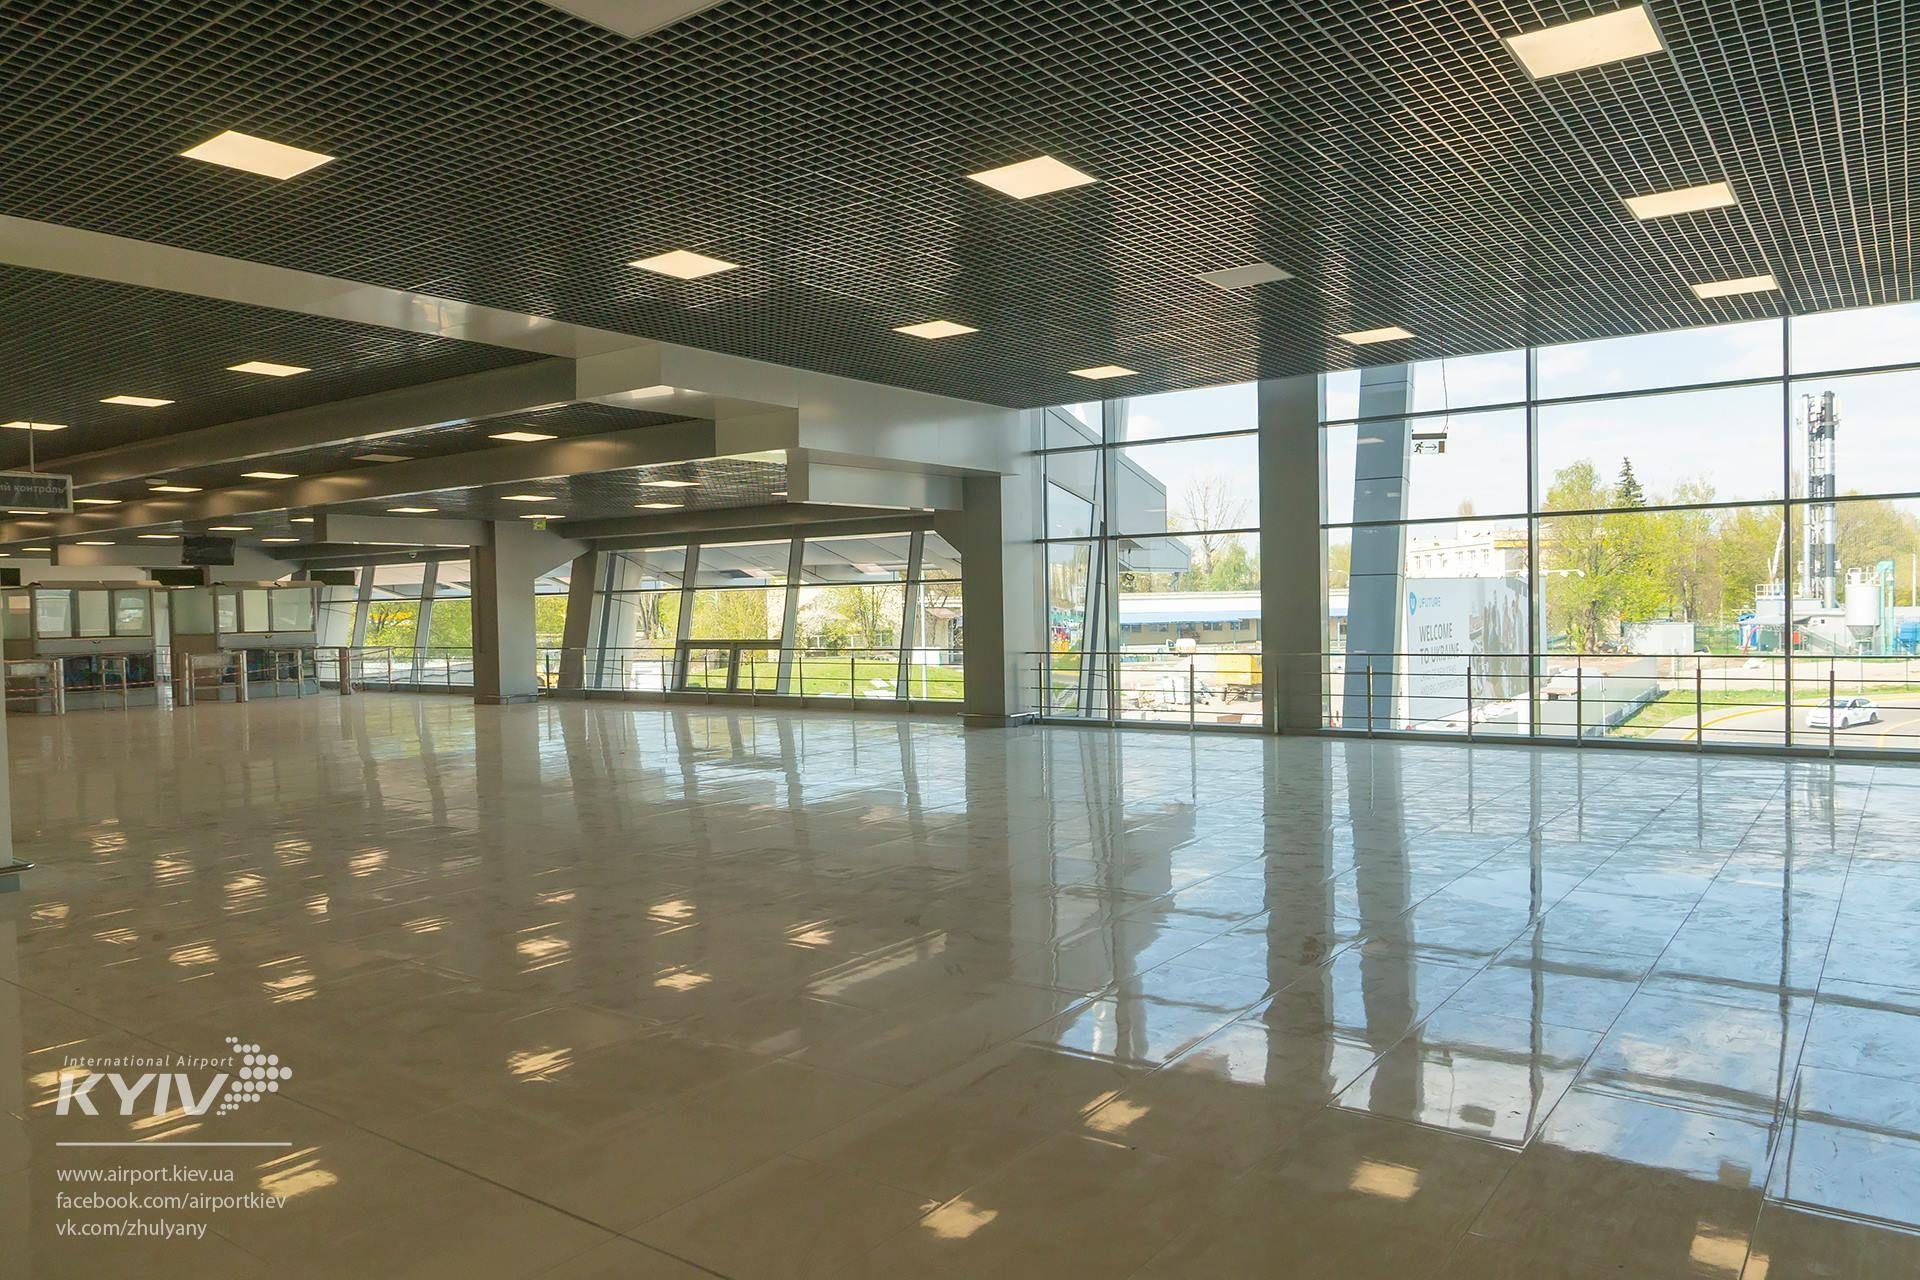 Аеропорт Київ  термінал А